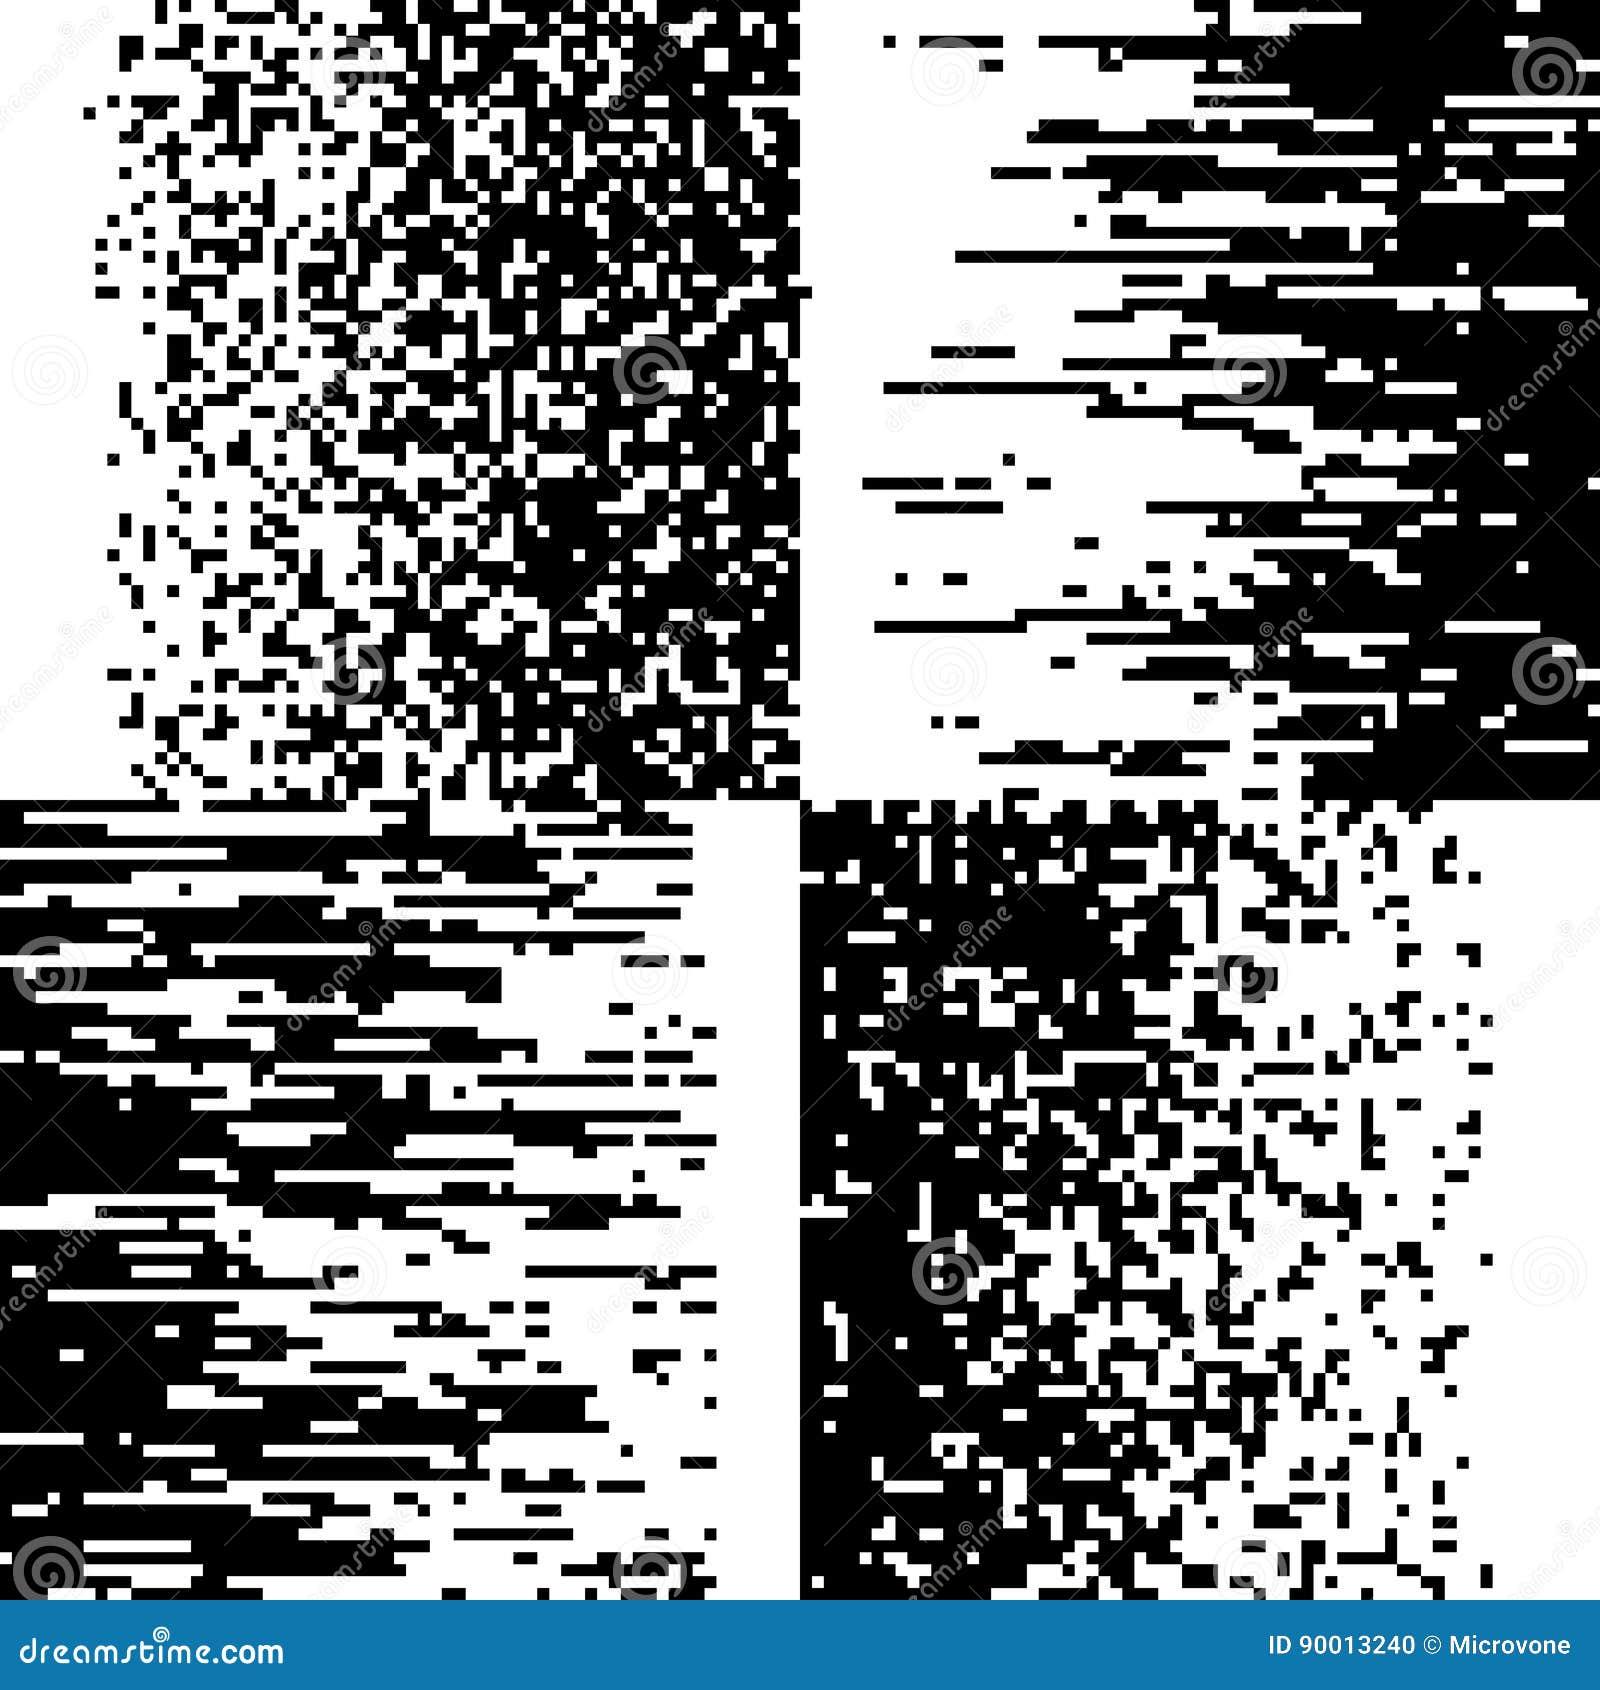 Black And White Pixelation, Pixel Gradient Mosaic